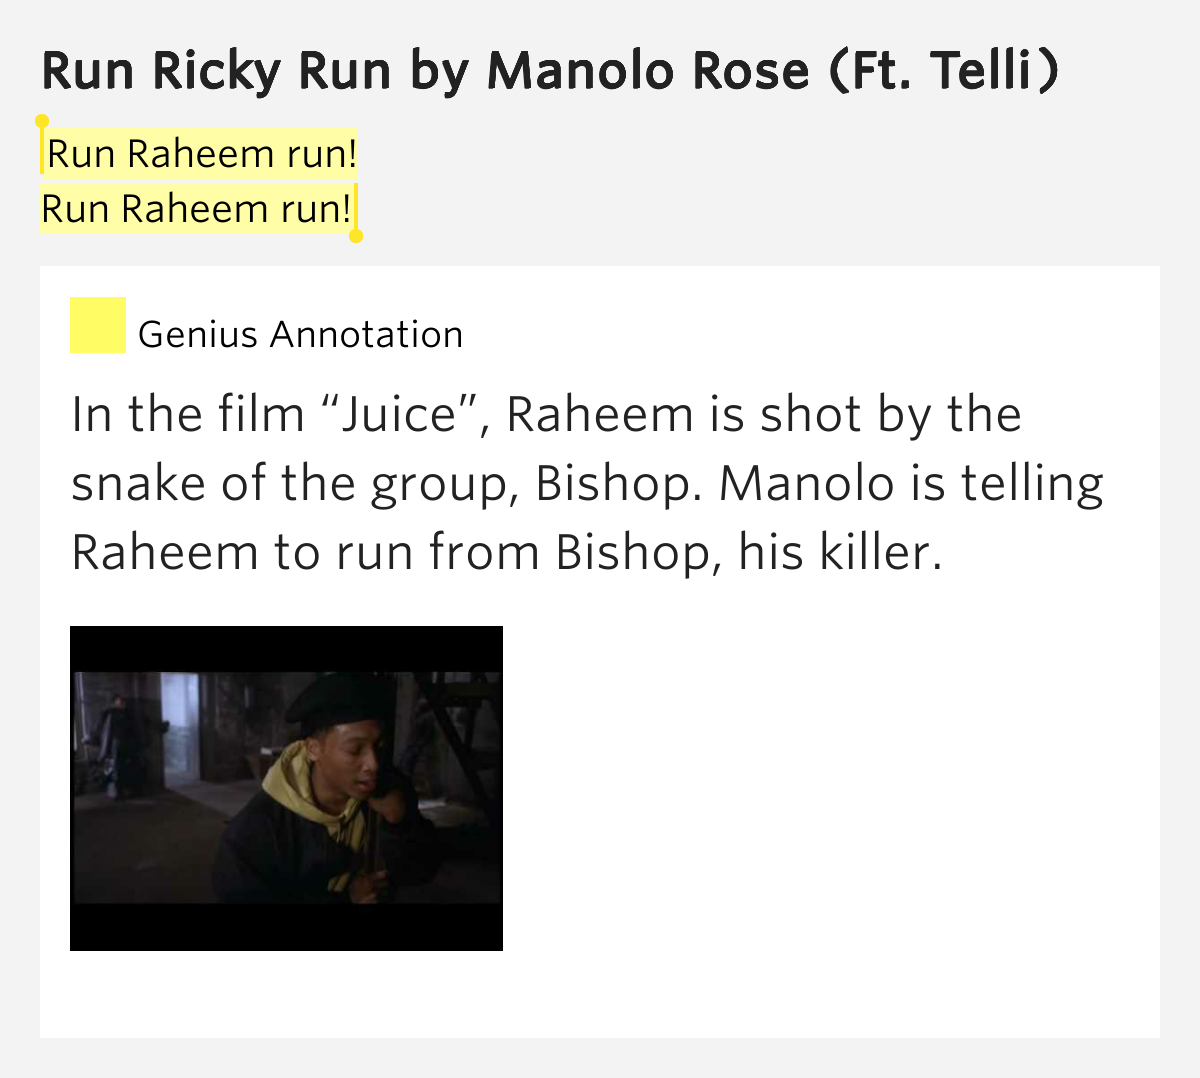 Run Raheem Run Run Raheem Run Run Ricky Run Lyrics